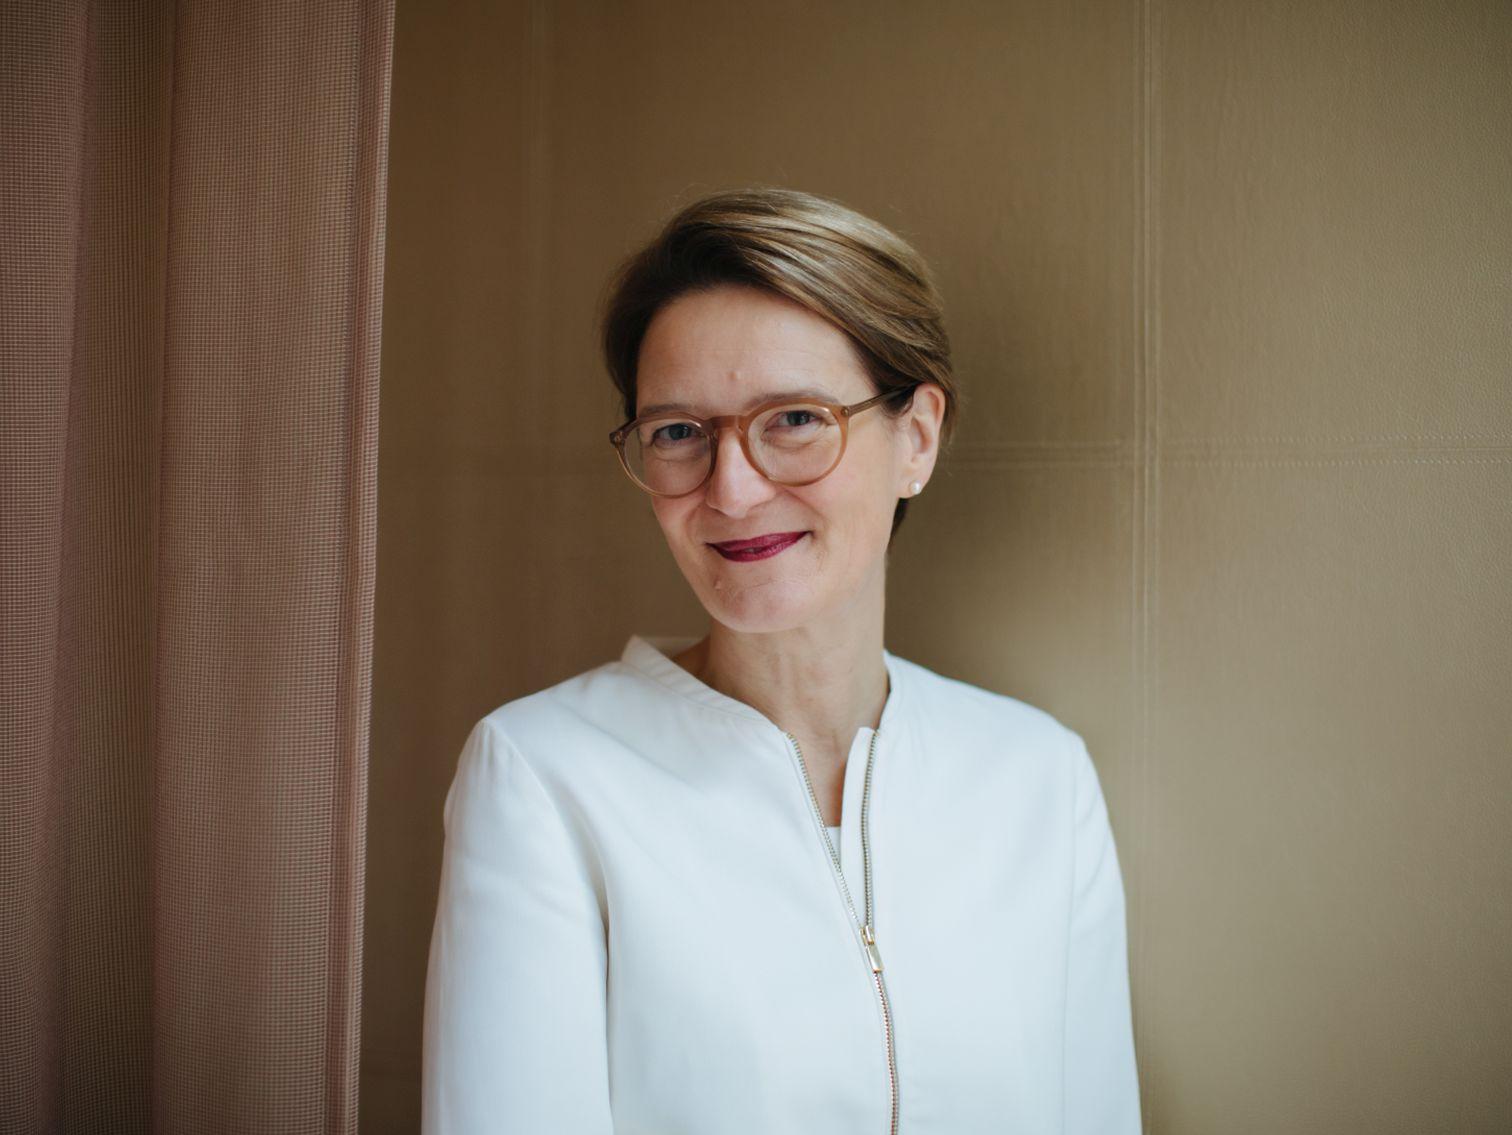 Anke Maas Human Resources Director Leonardo Hotels Central Europe